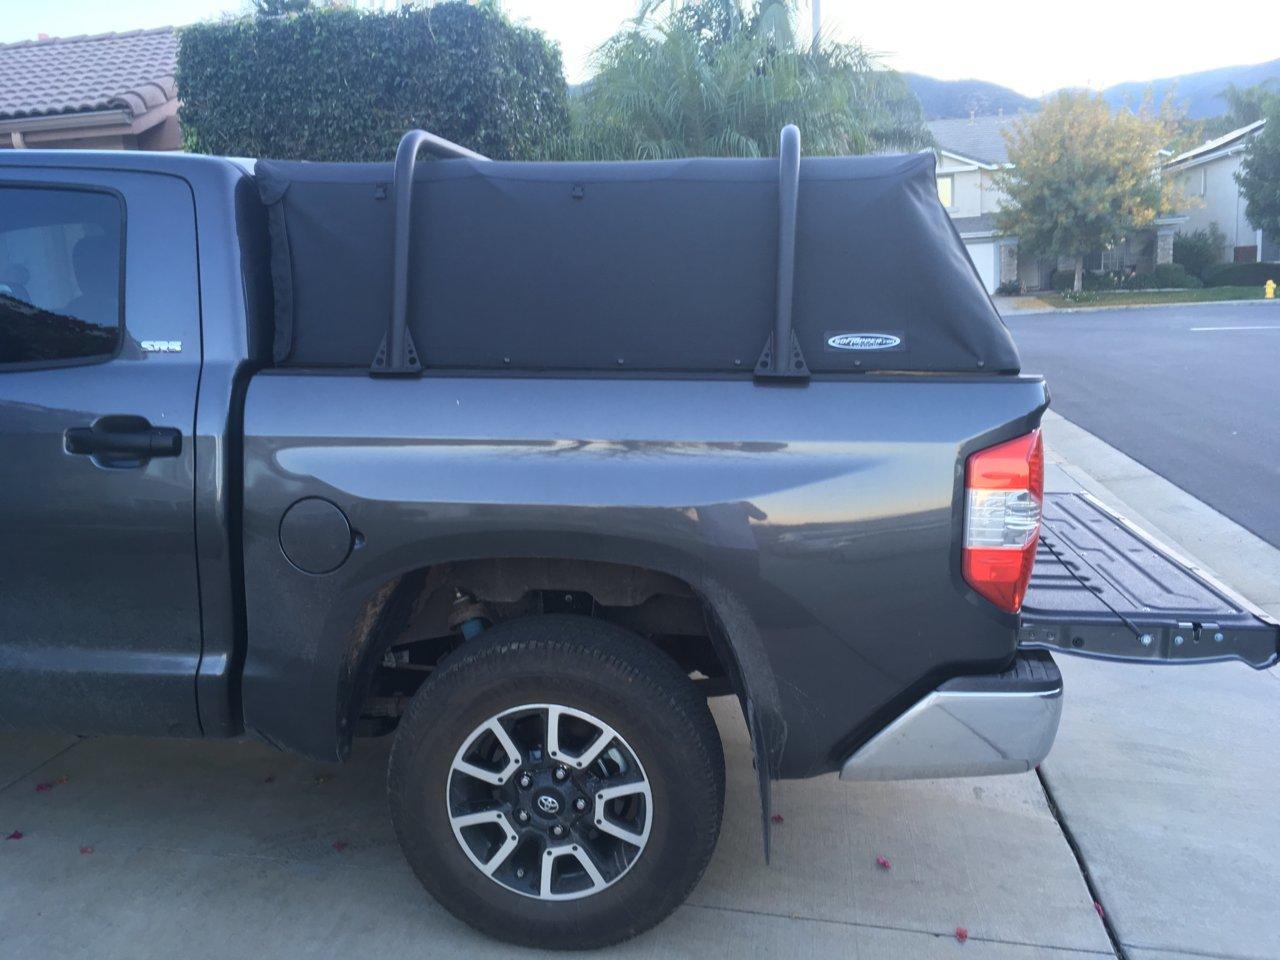 Who has a nice rack? | Page 8 | Toyota Tundra Forum